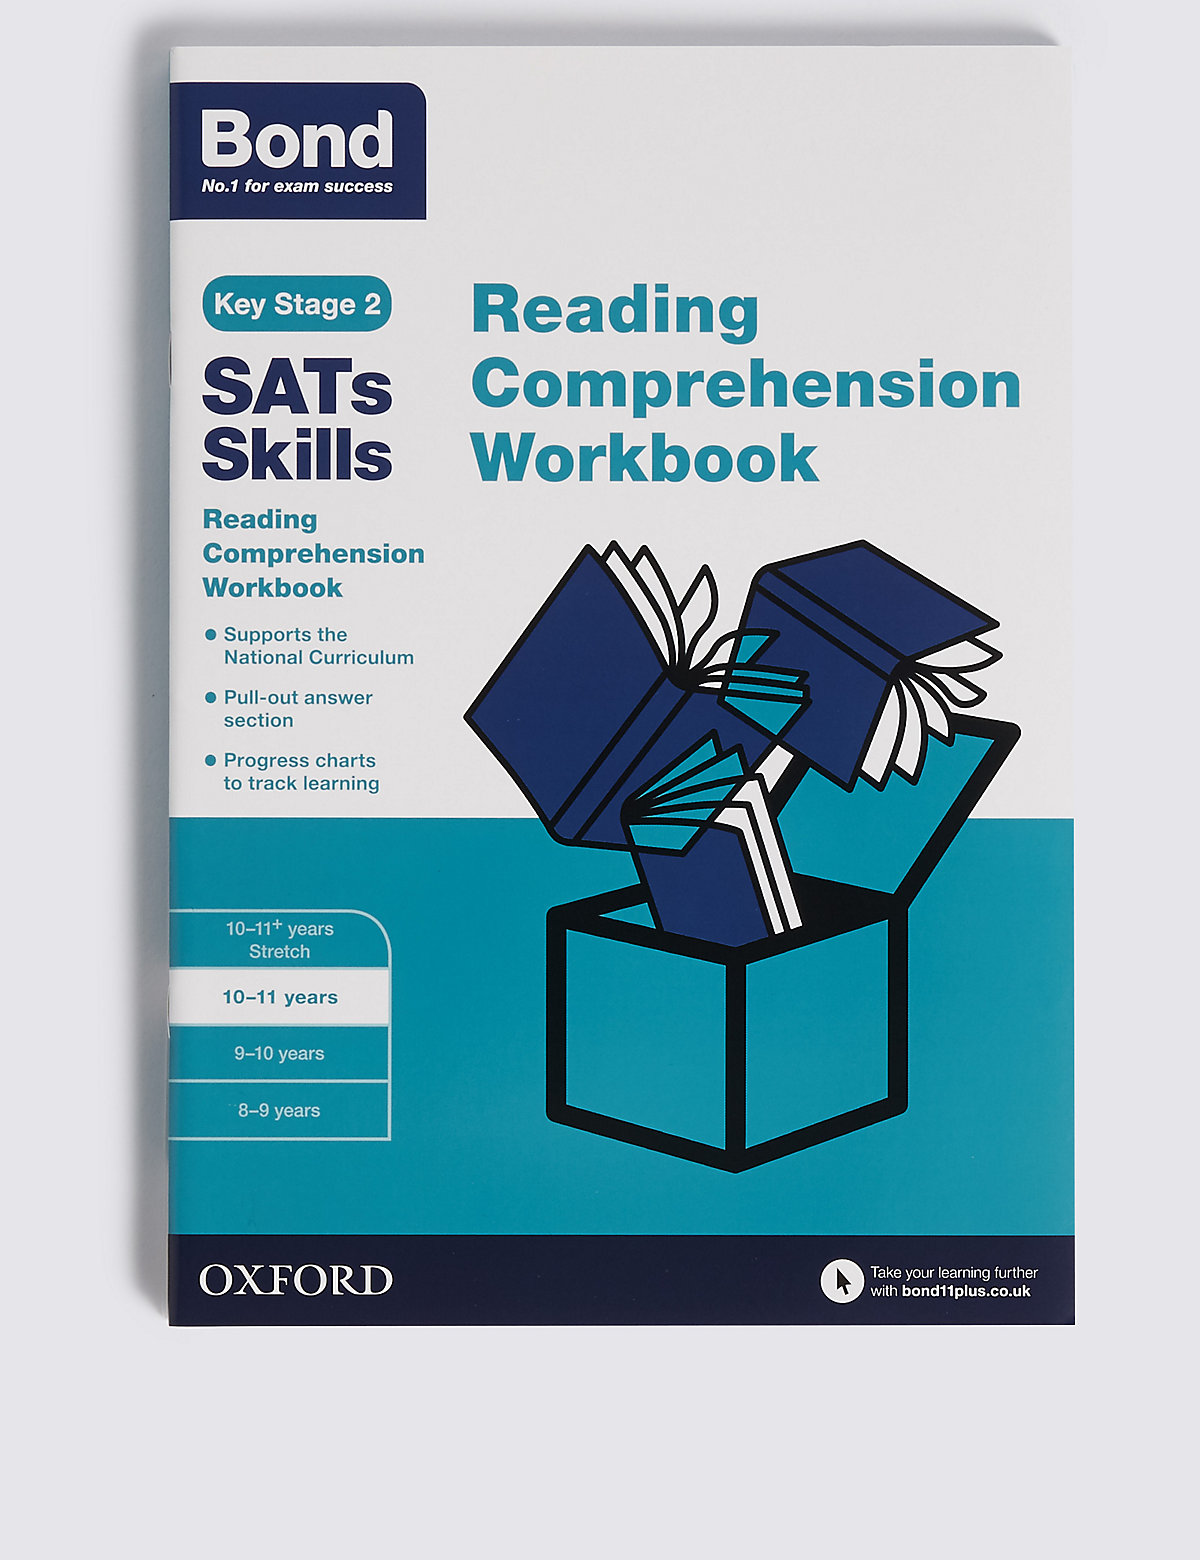 Workbooks key stage 2 workbooks : Bond SATs Skills English | Bluewater | £10.00